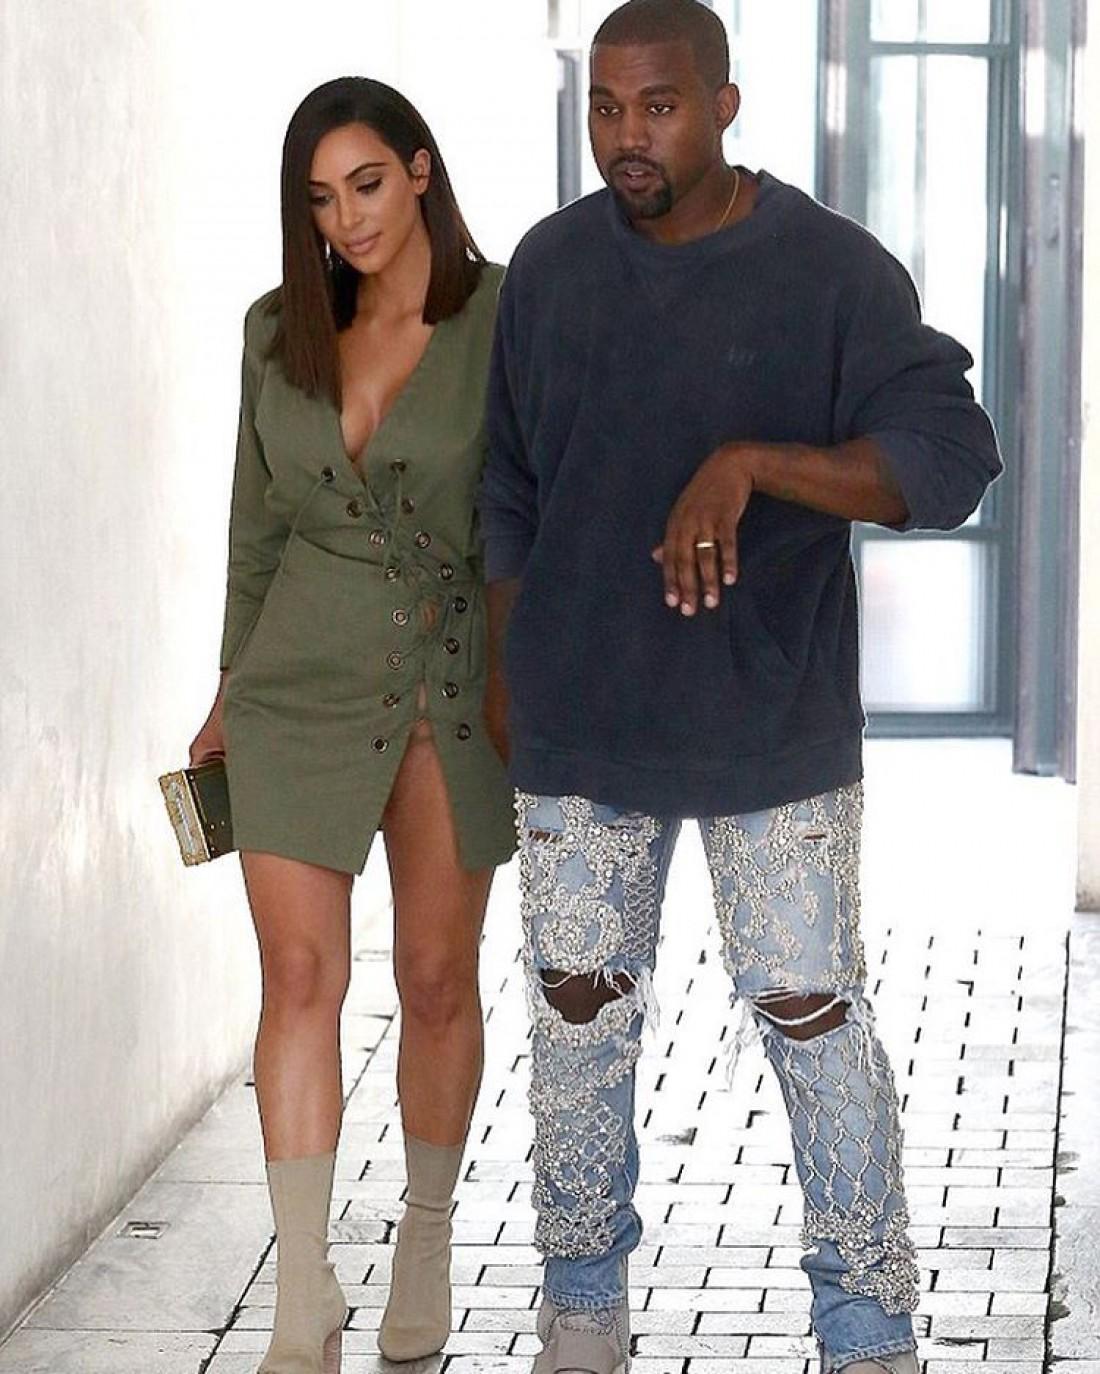 Ким с мужем Канье